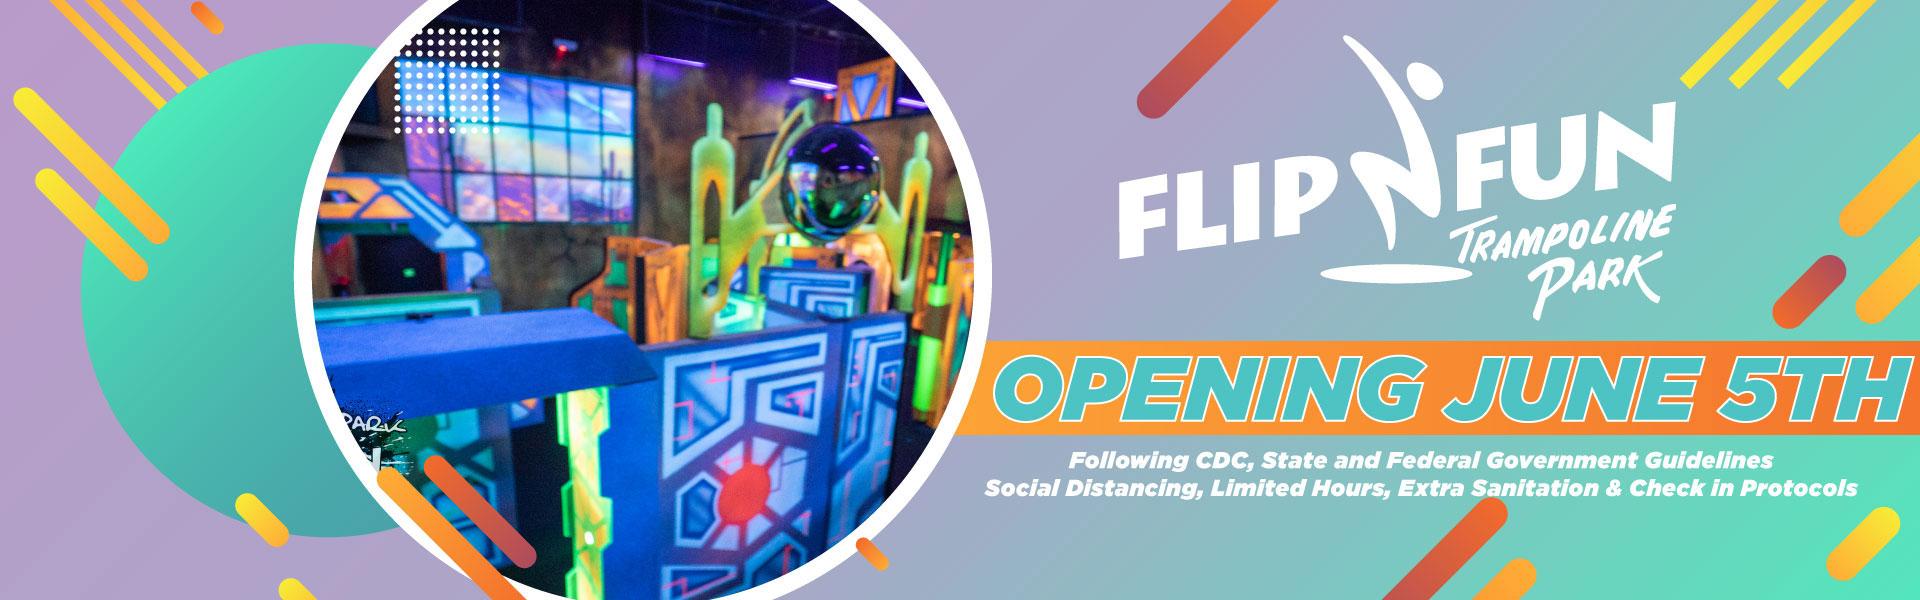 flip-n-fun-2020-opening-june-5th